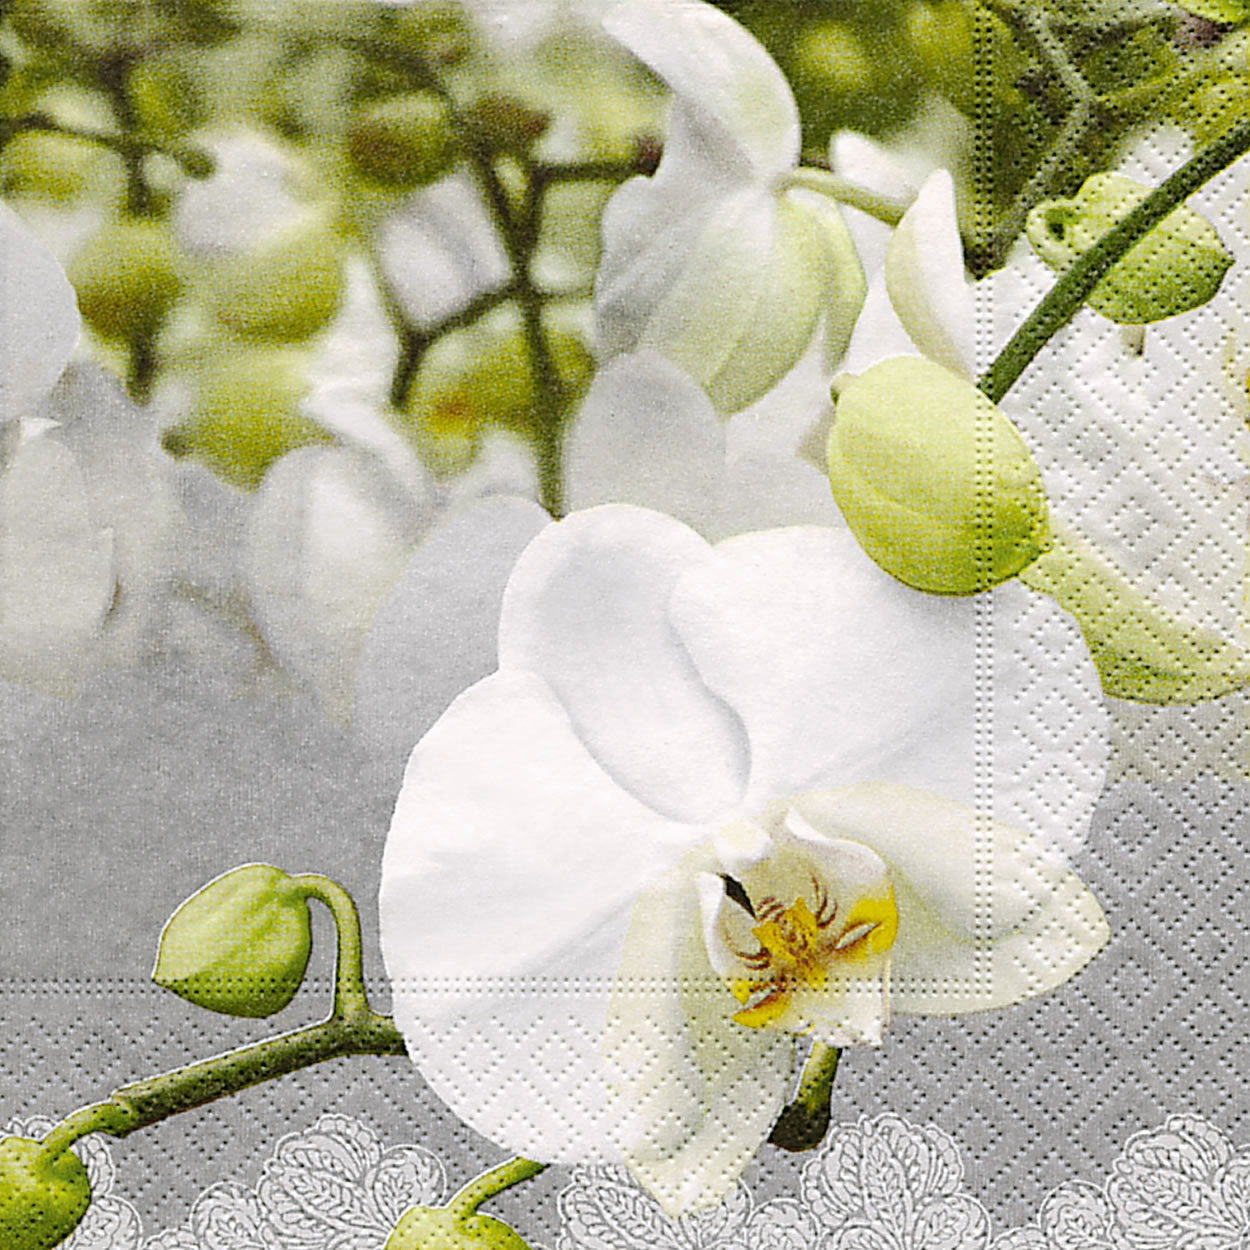 20 Servietten - 33 x 33 cm ,  Blumen - Orchideen,  Everyday,  lunchservietten